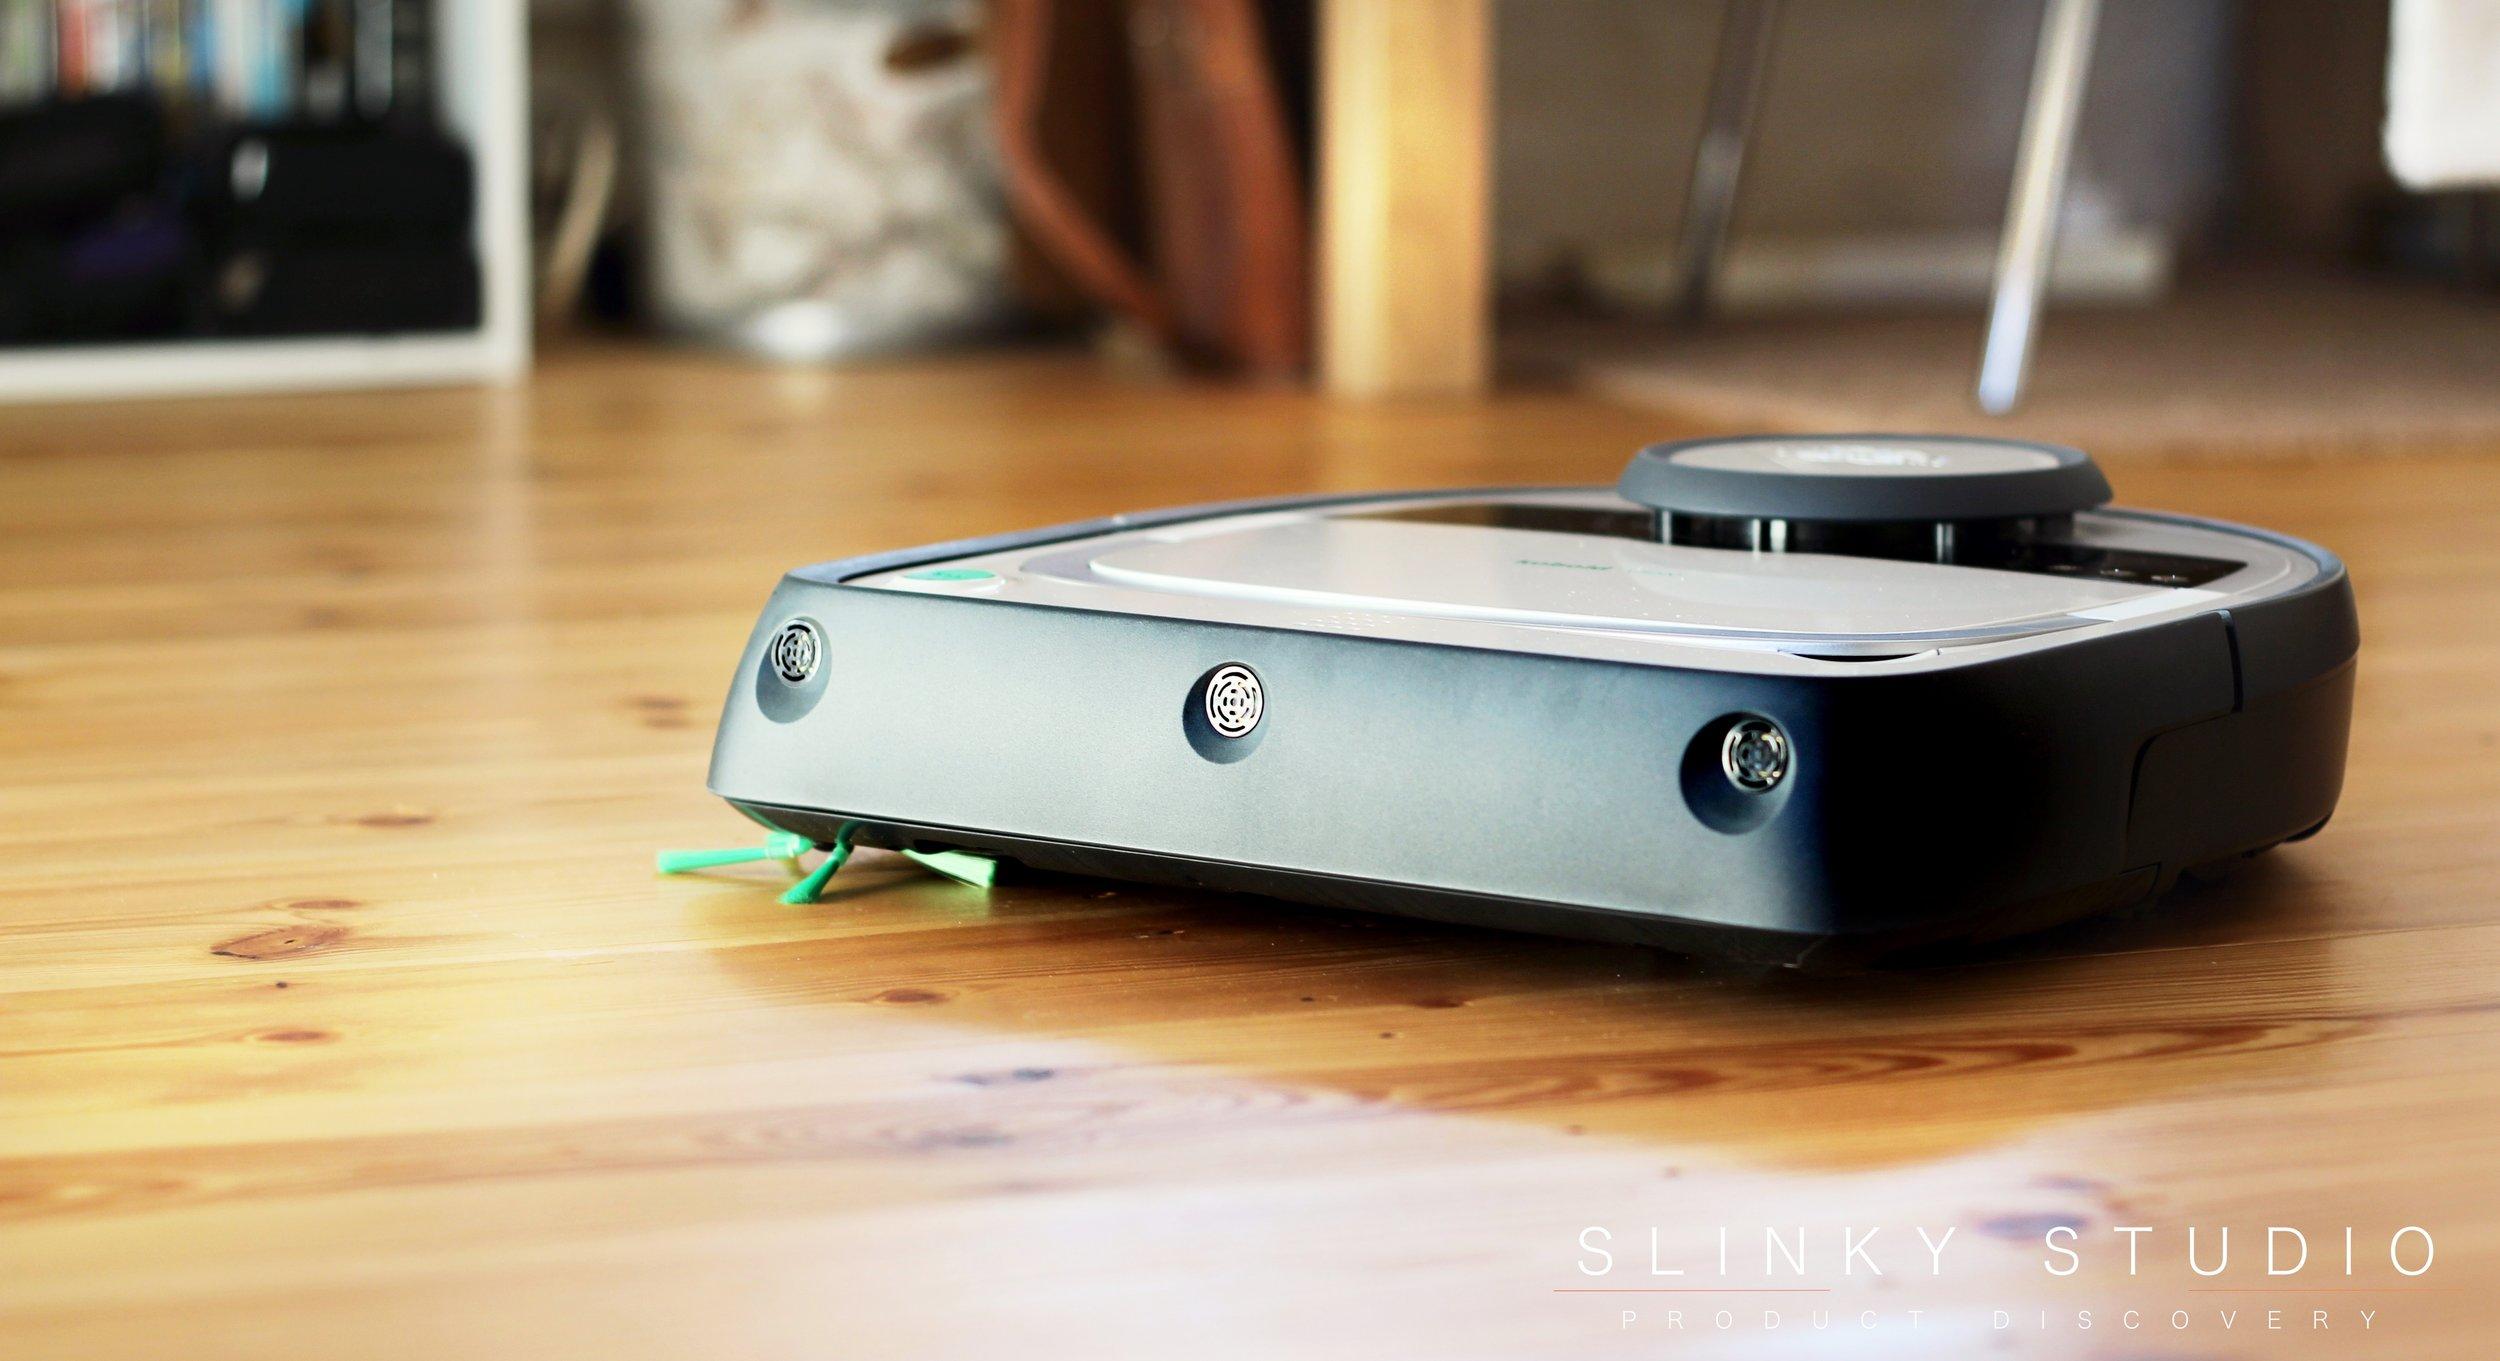 Vorwerk Kobold VR200 Robot Cleaner Front View.jpg